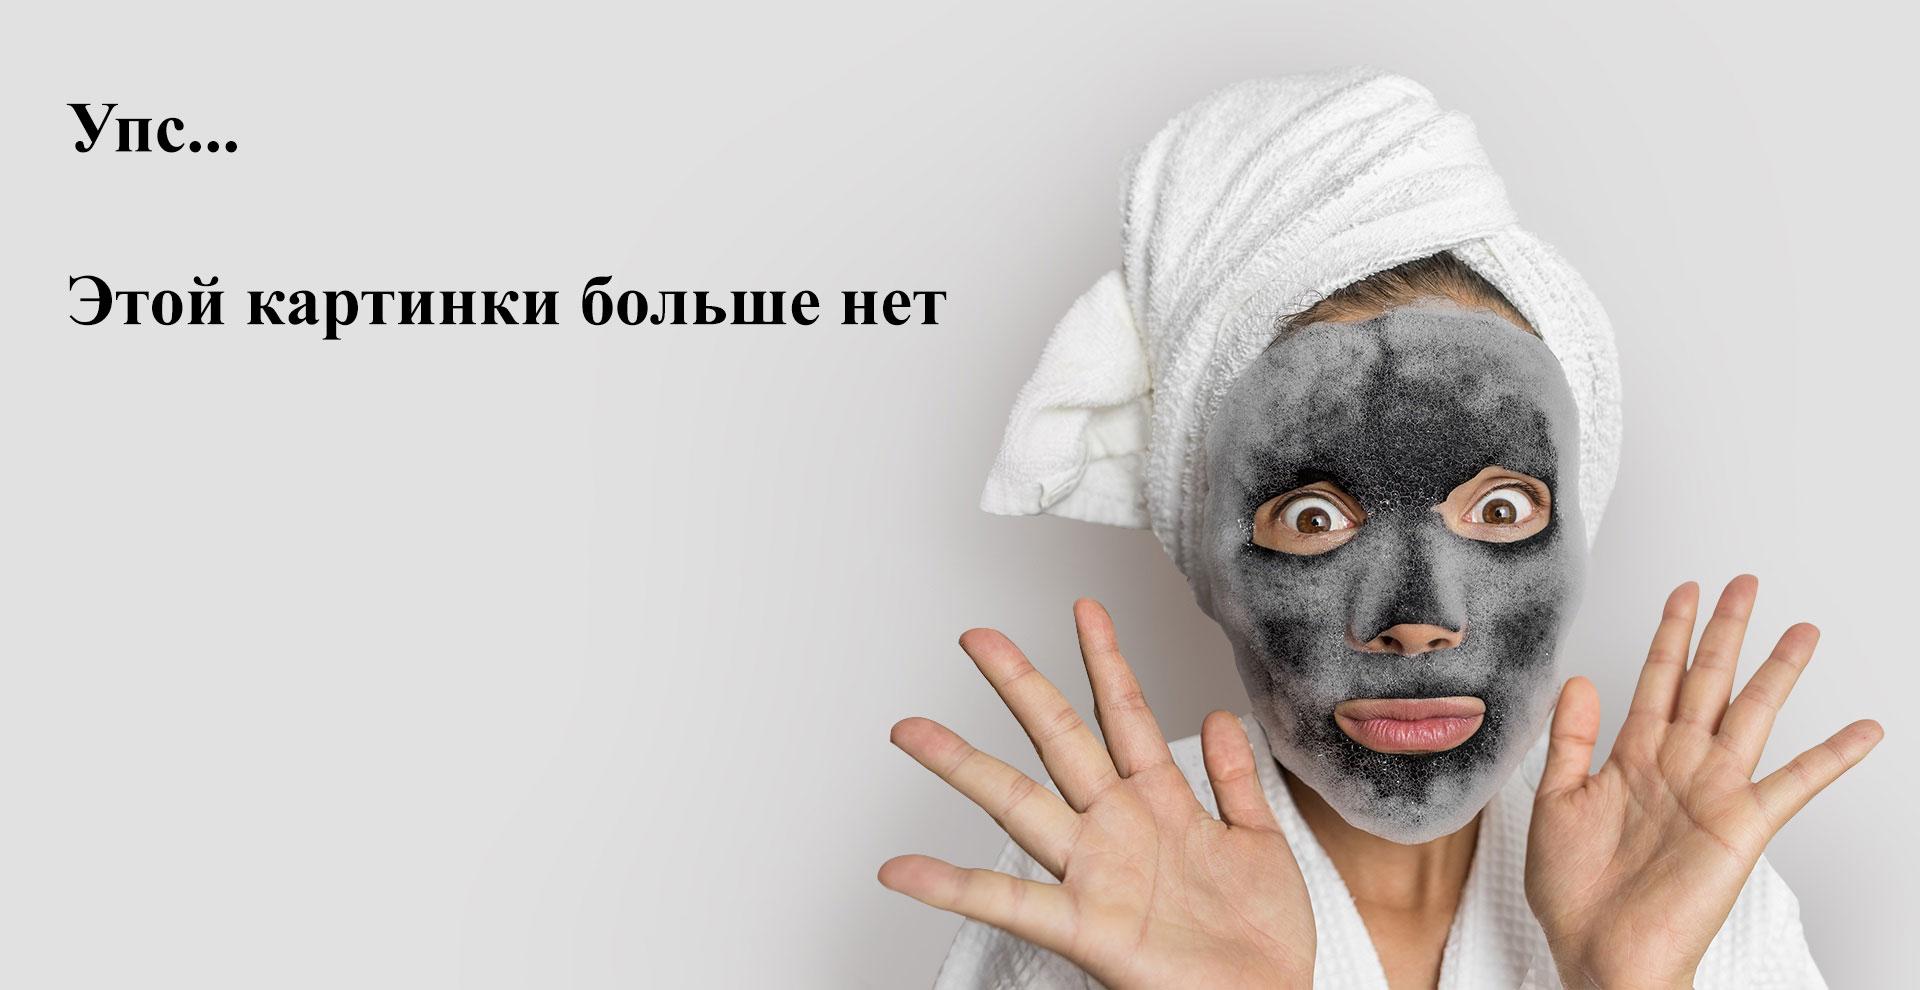 Cruset, Спрей для волос Extra Shine, 200 мл (УЦЕНКА)